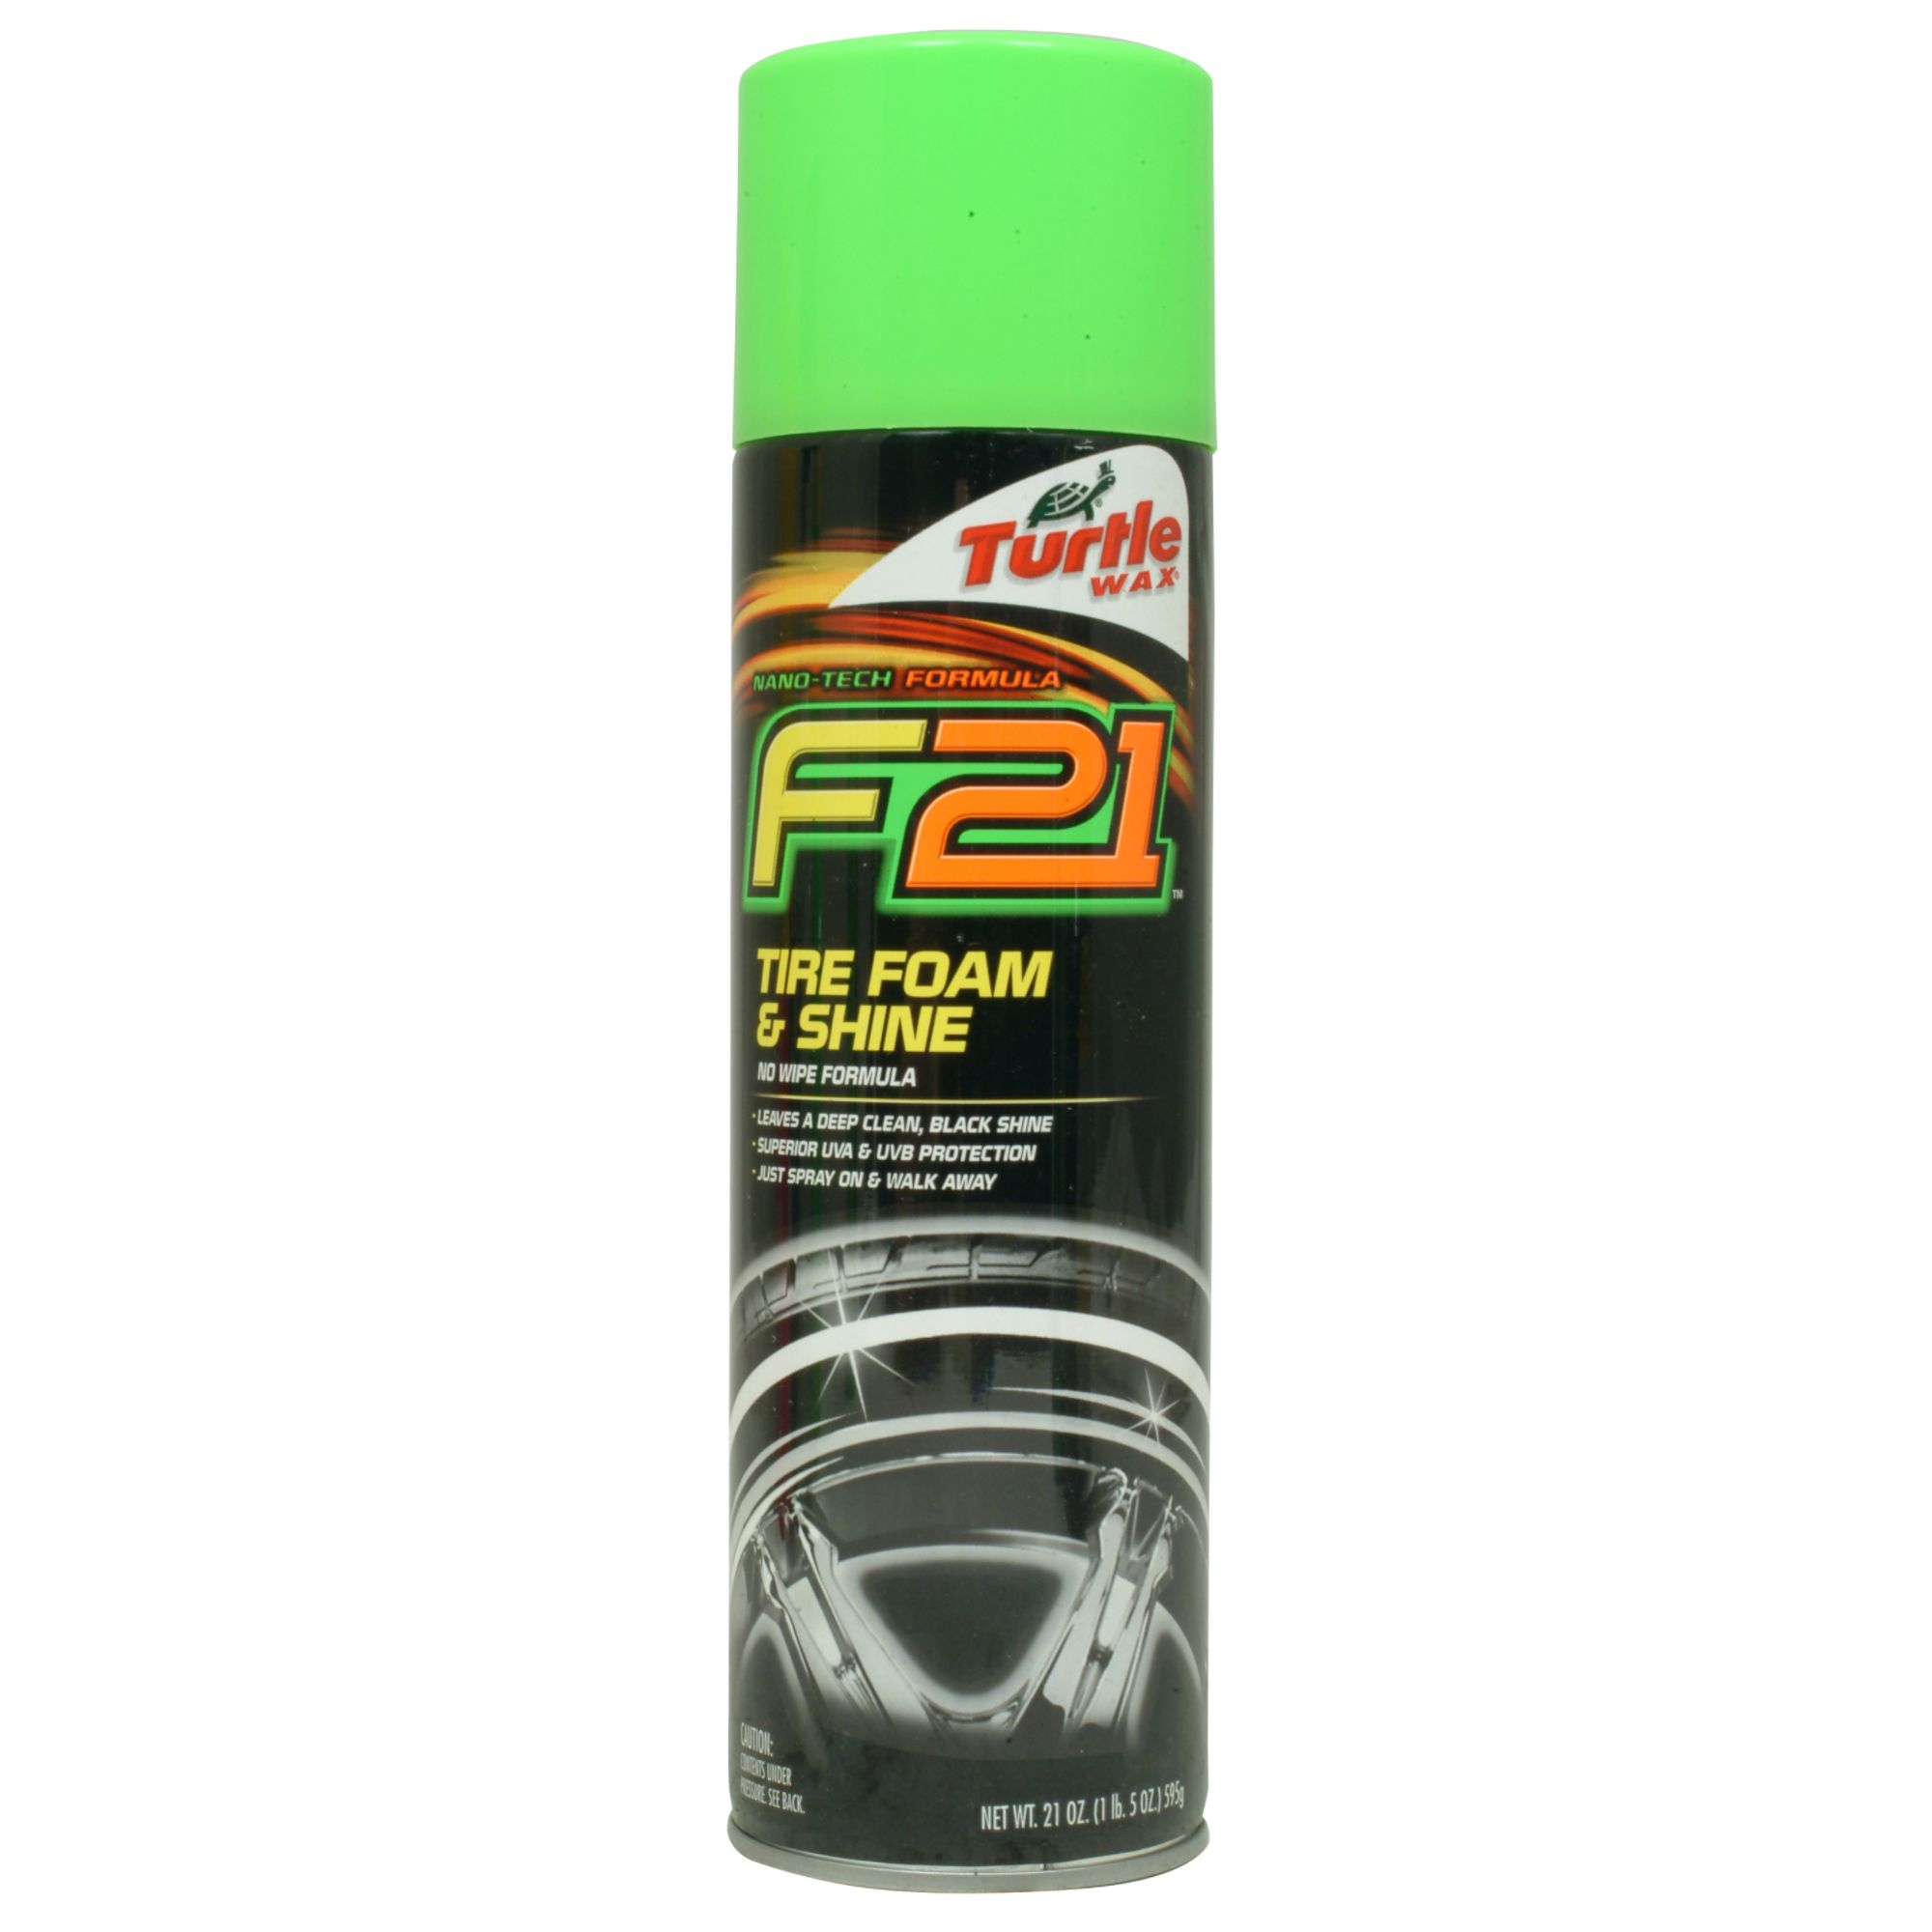 Turtle Wax Formula 2001 Tire Foam-N-Shine PartNumber: 082W825648110001P KsnValue: 82564811 MfgPartNumber: T49R